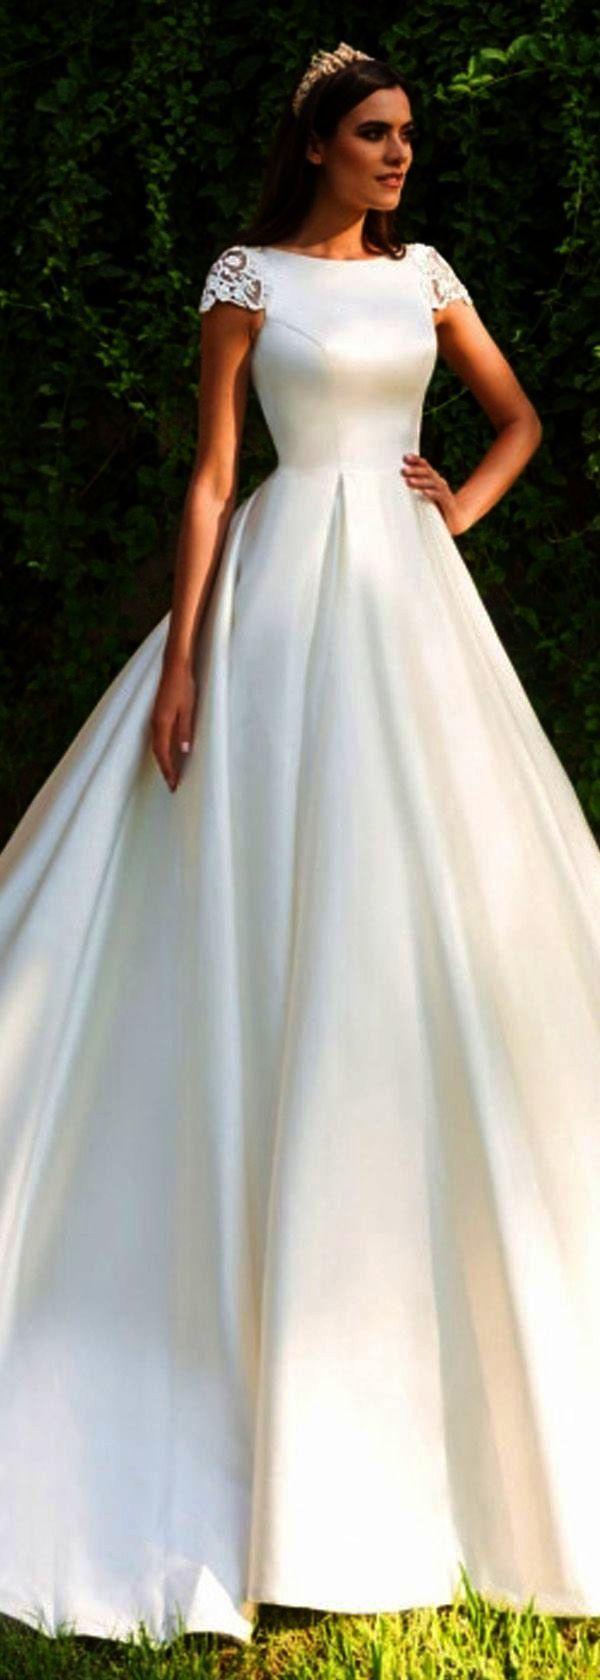 Cheap Wedding Dress Hire In Cape Town Saddha